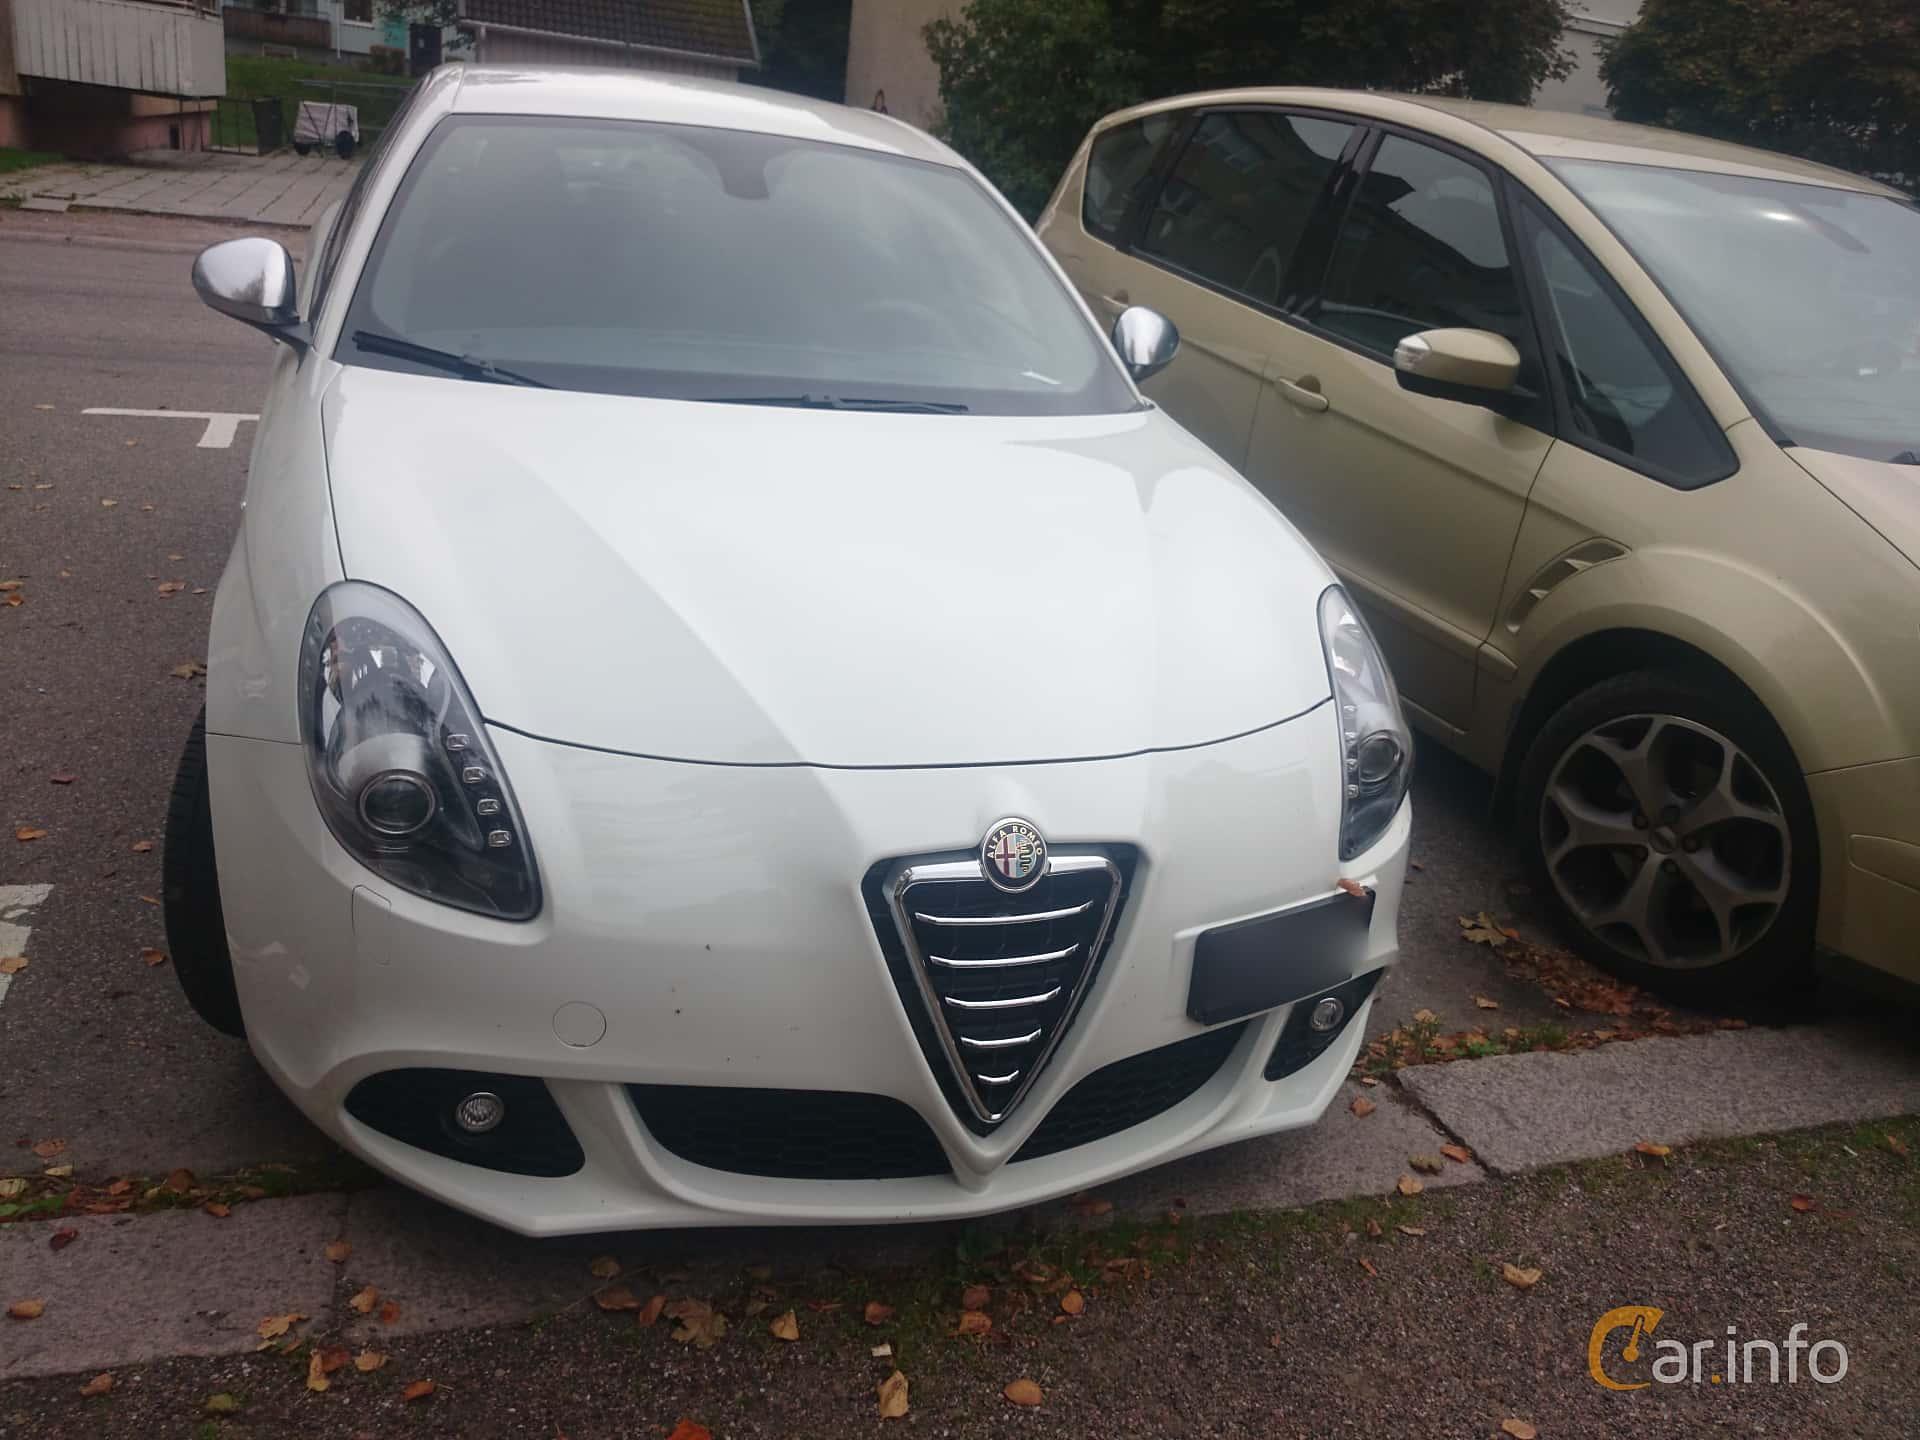 2 images of Alfa Romeo Giulietta 1 4 TB 16V MultiAir Manual 170hp